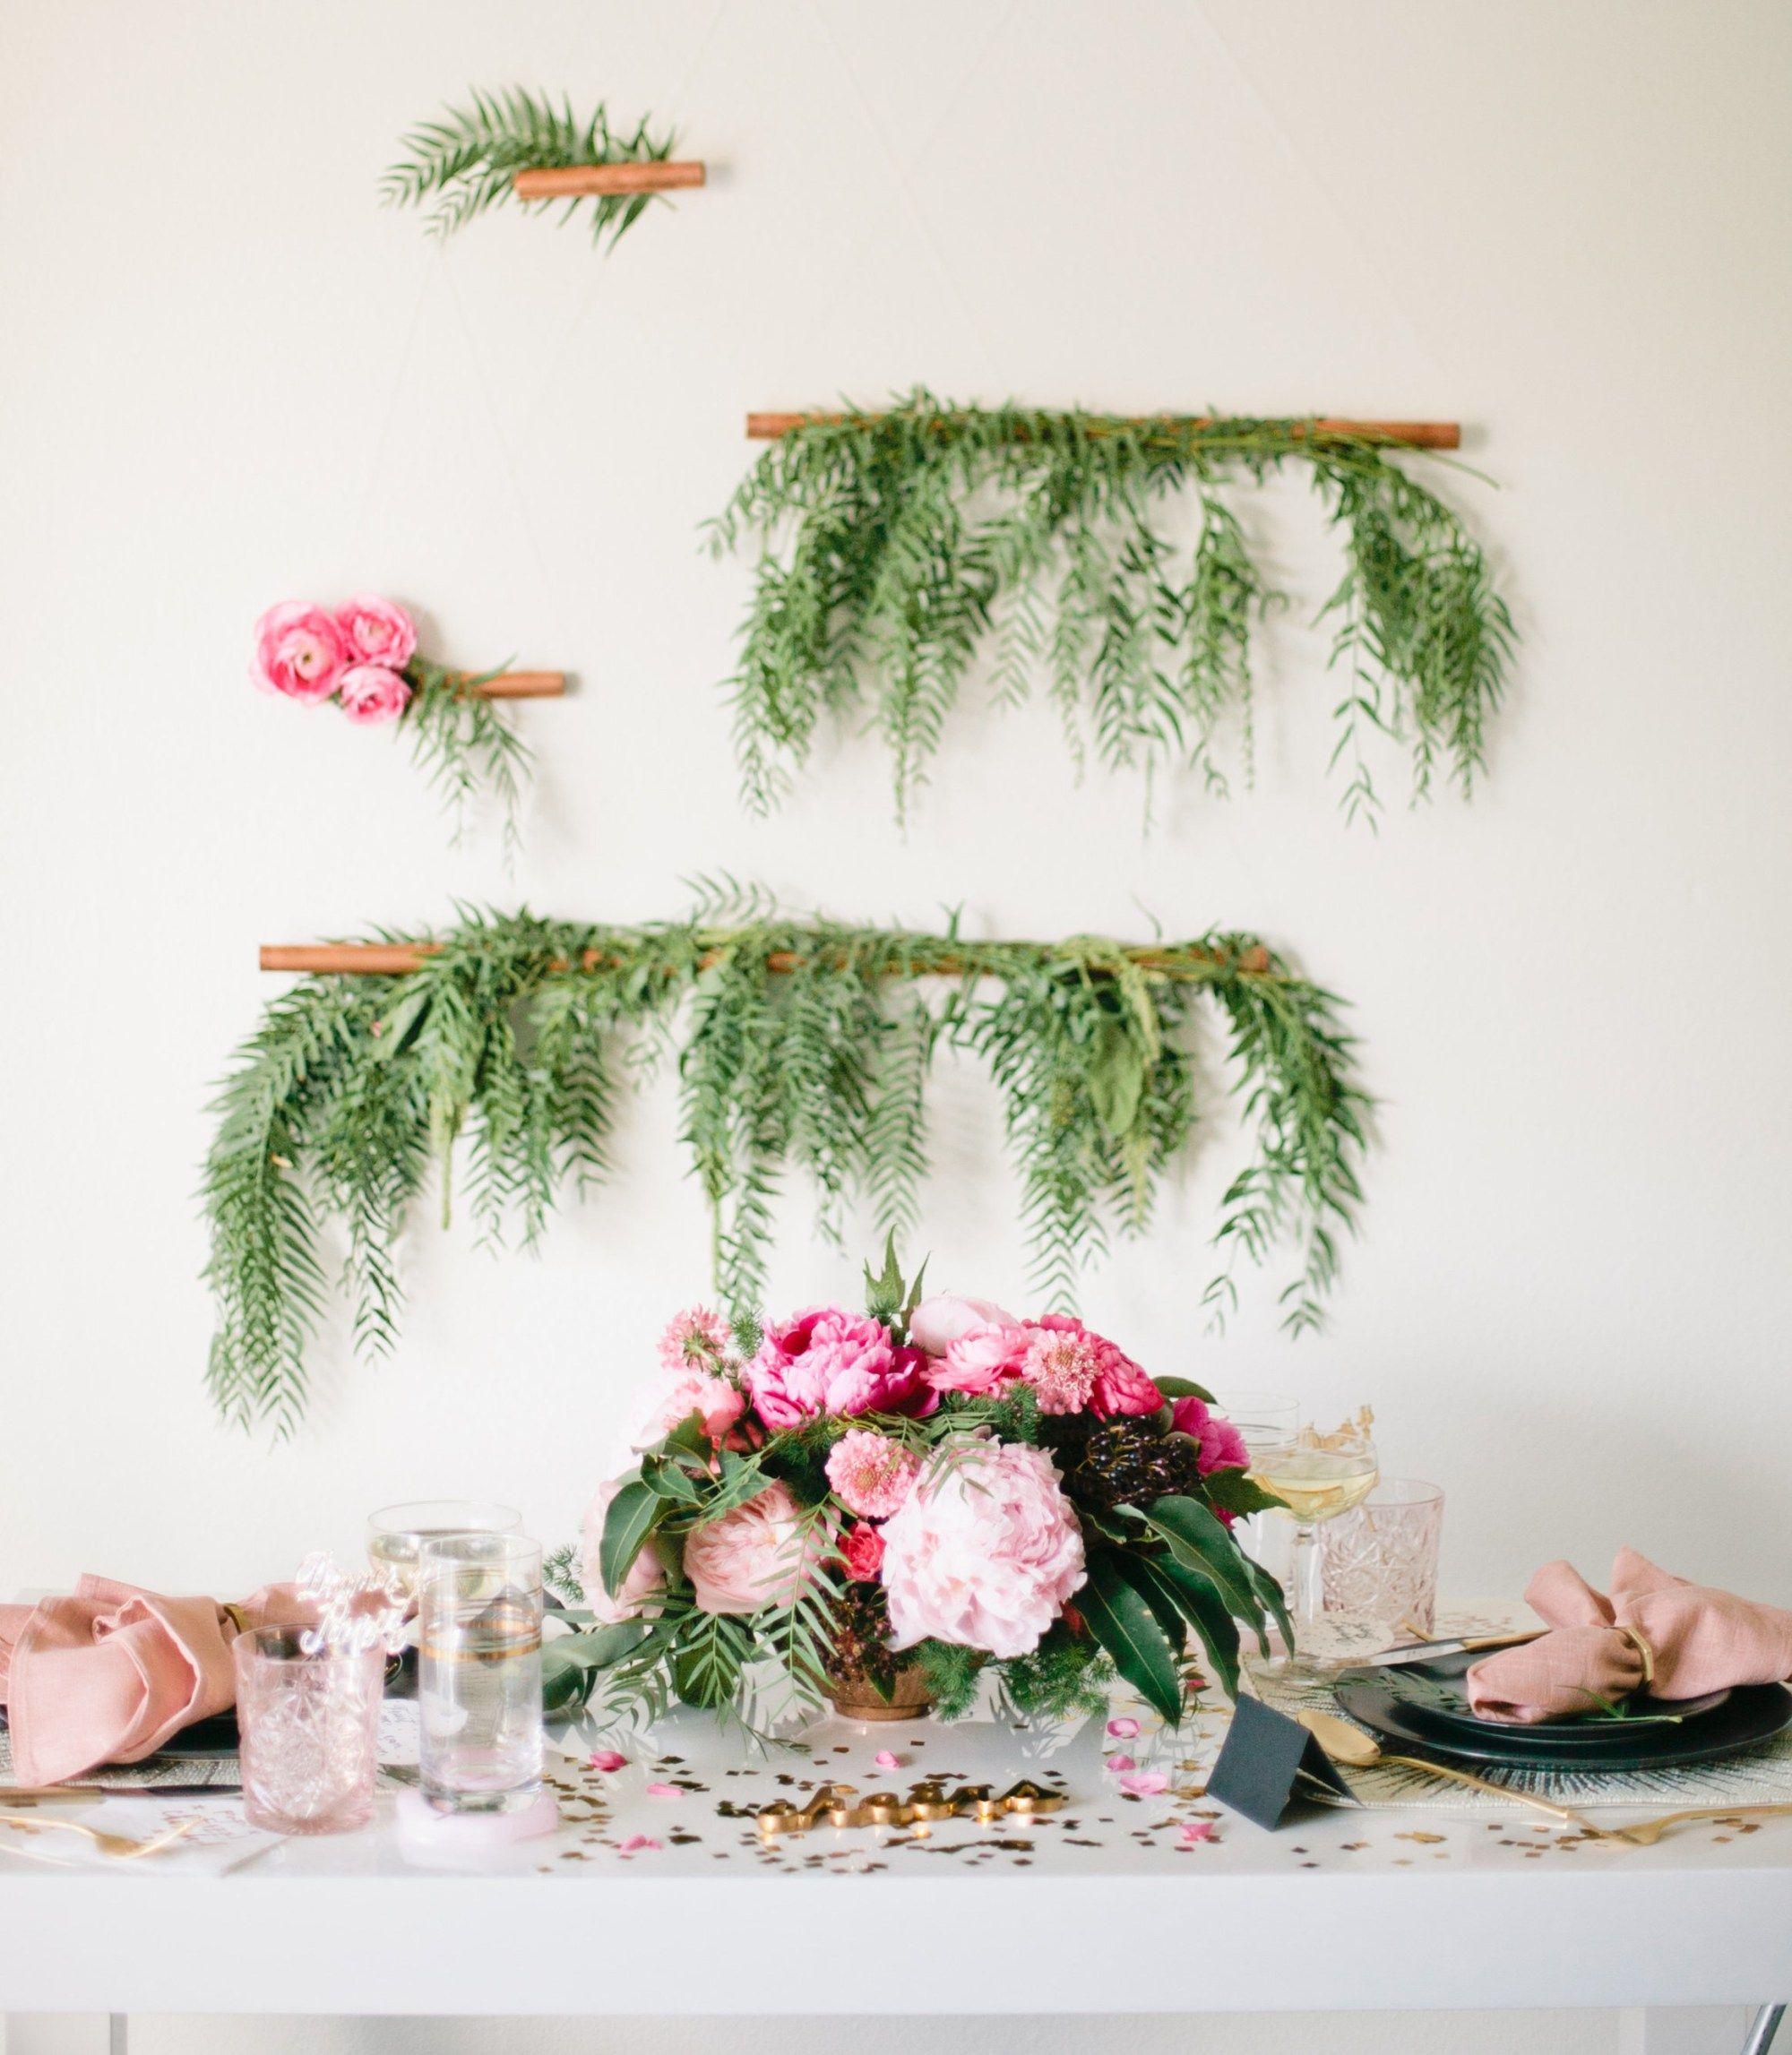 MV Florals | Beijos events, New years eve dinner, Dinner ...